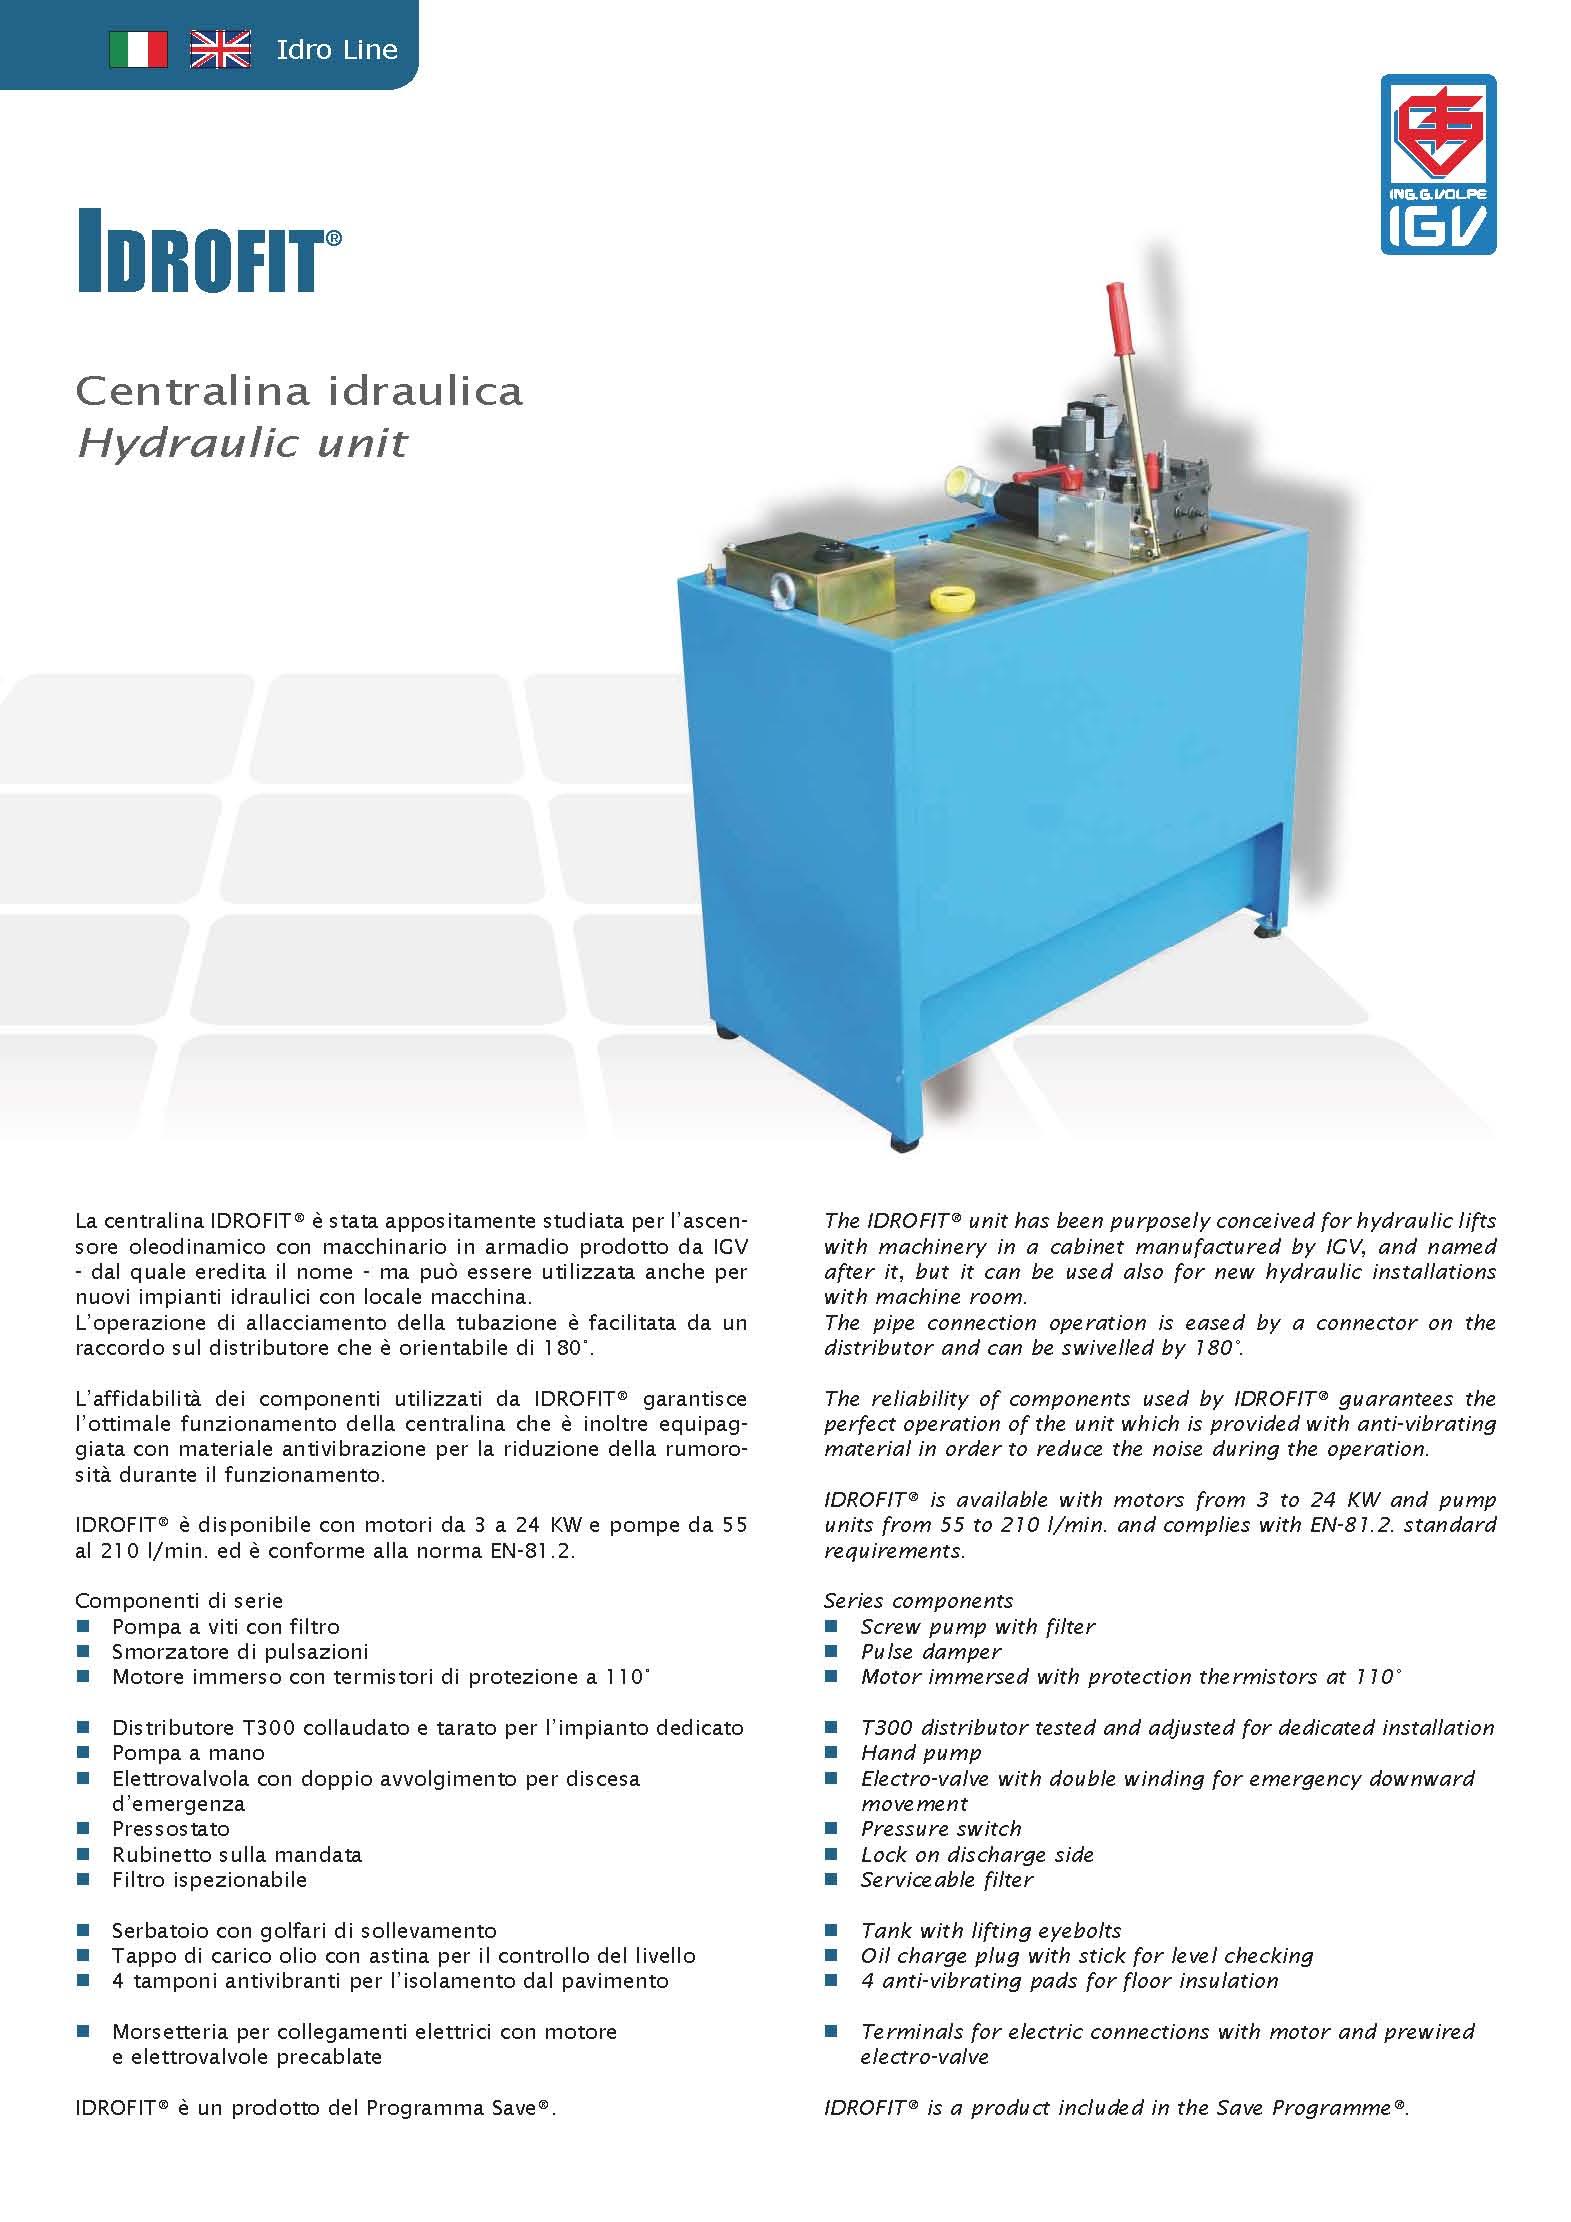 IGV-Idrofit_Pagina_1